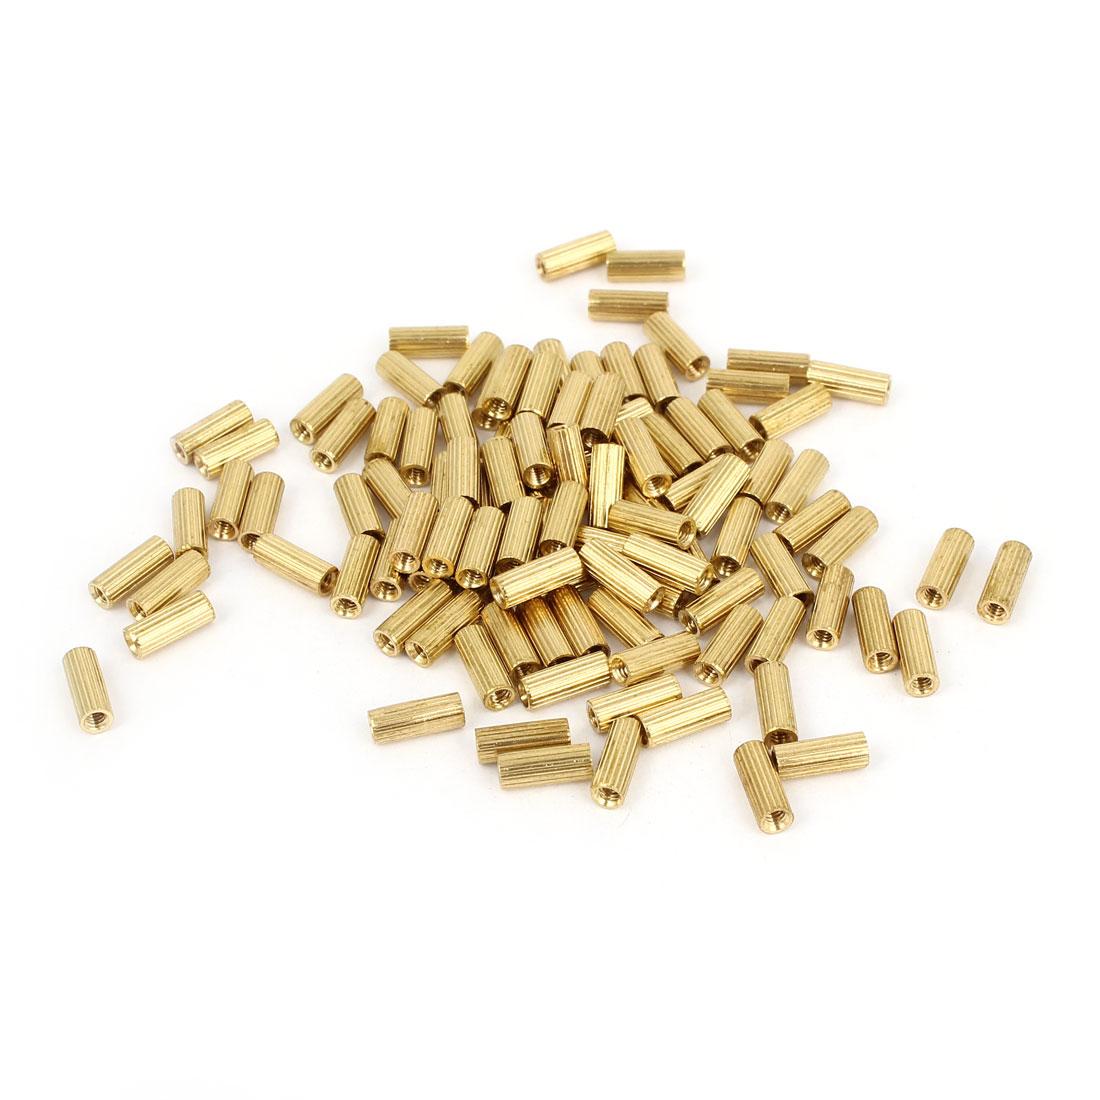 Brass Female Threaded Pillars Standoff Spacer Gold Tone M2x8mm 100 Pcs